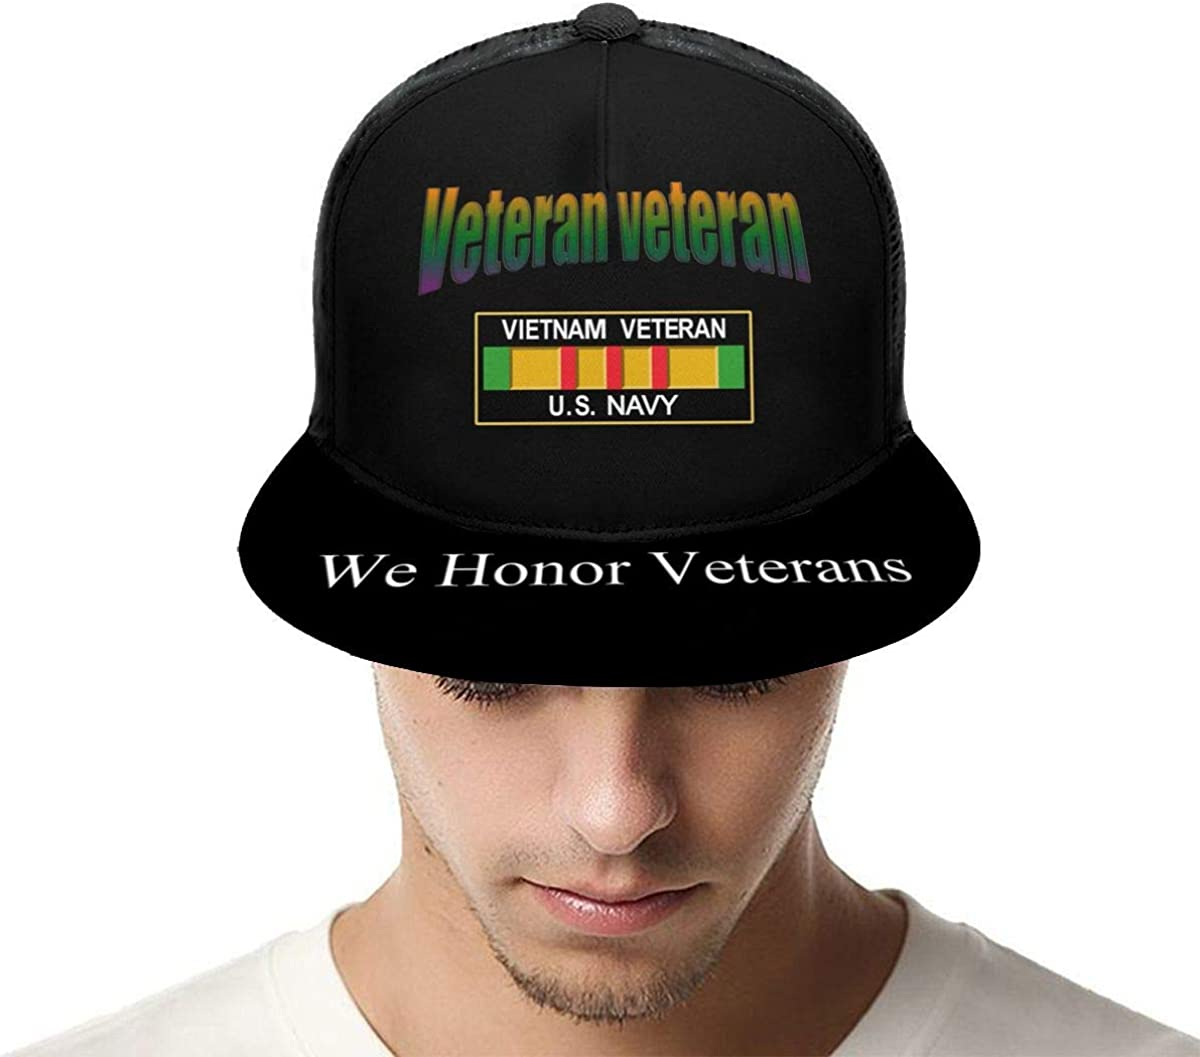 Vietnam Veteran U.S Navy Classic Grid Caps Flat Along Baseball Hats Snapback Men Women Hats Adjustable